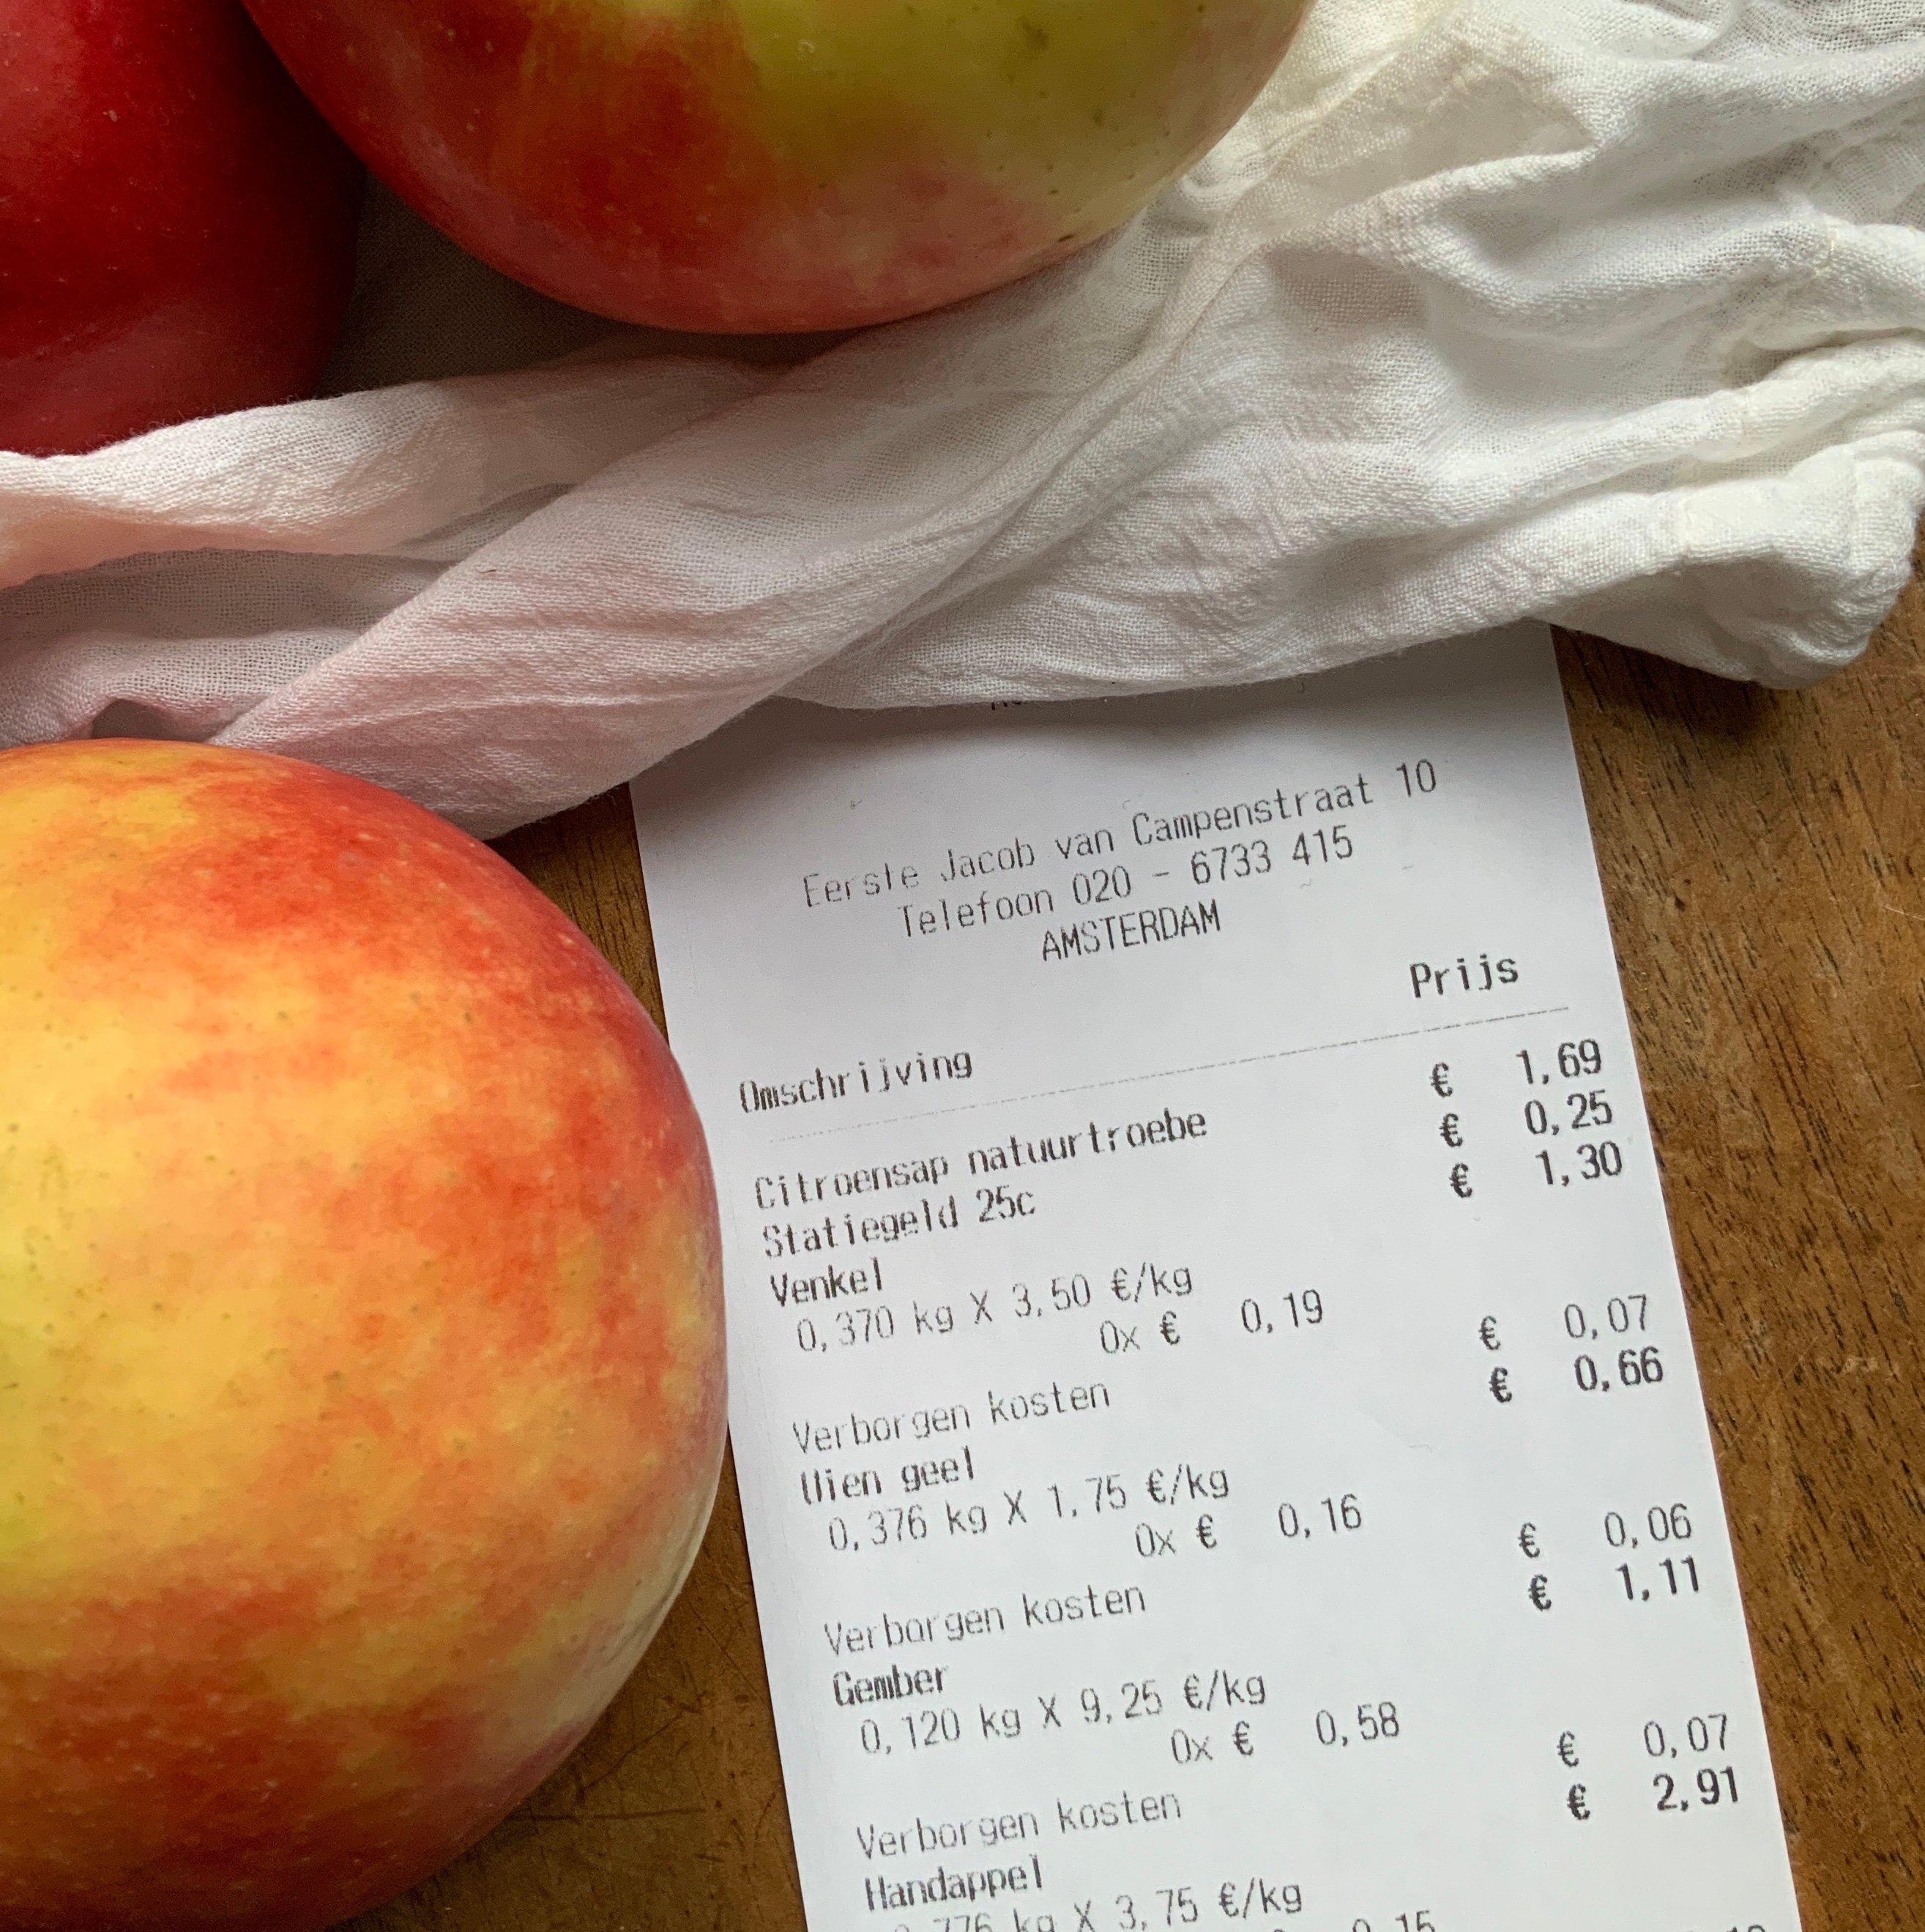 Grocery store receipt listing hidden costs